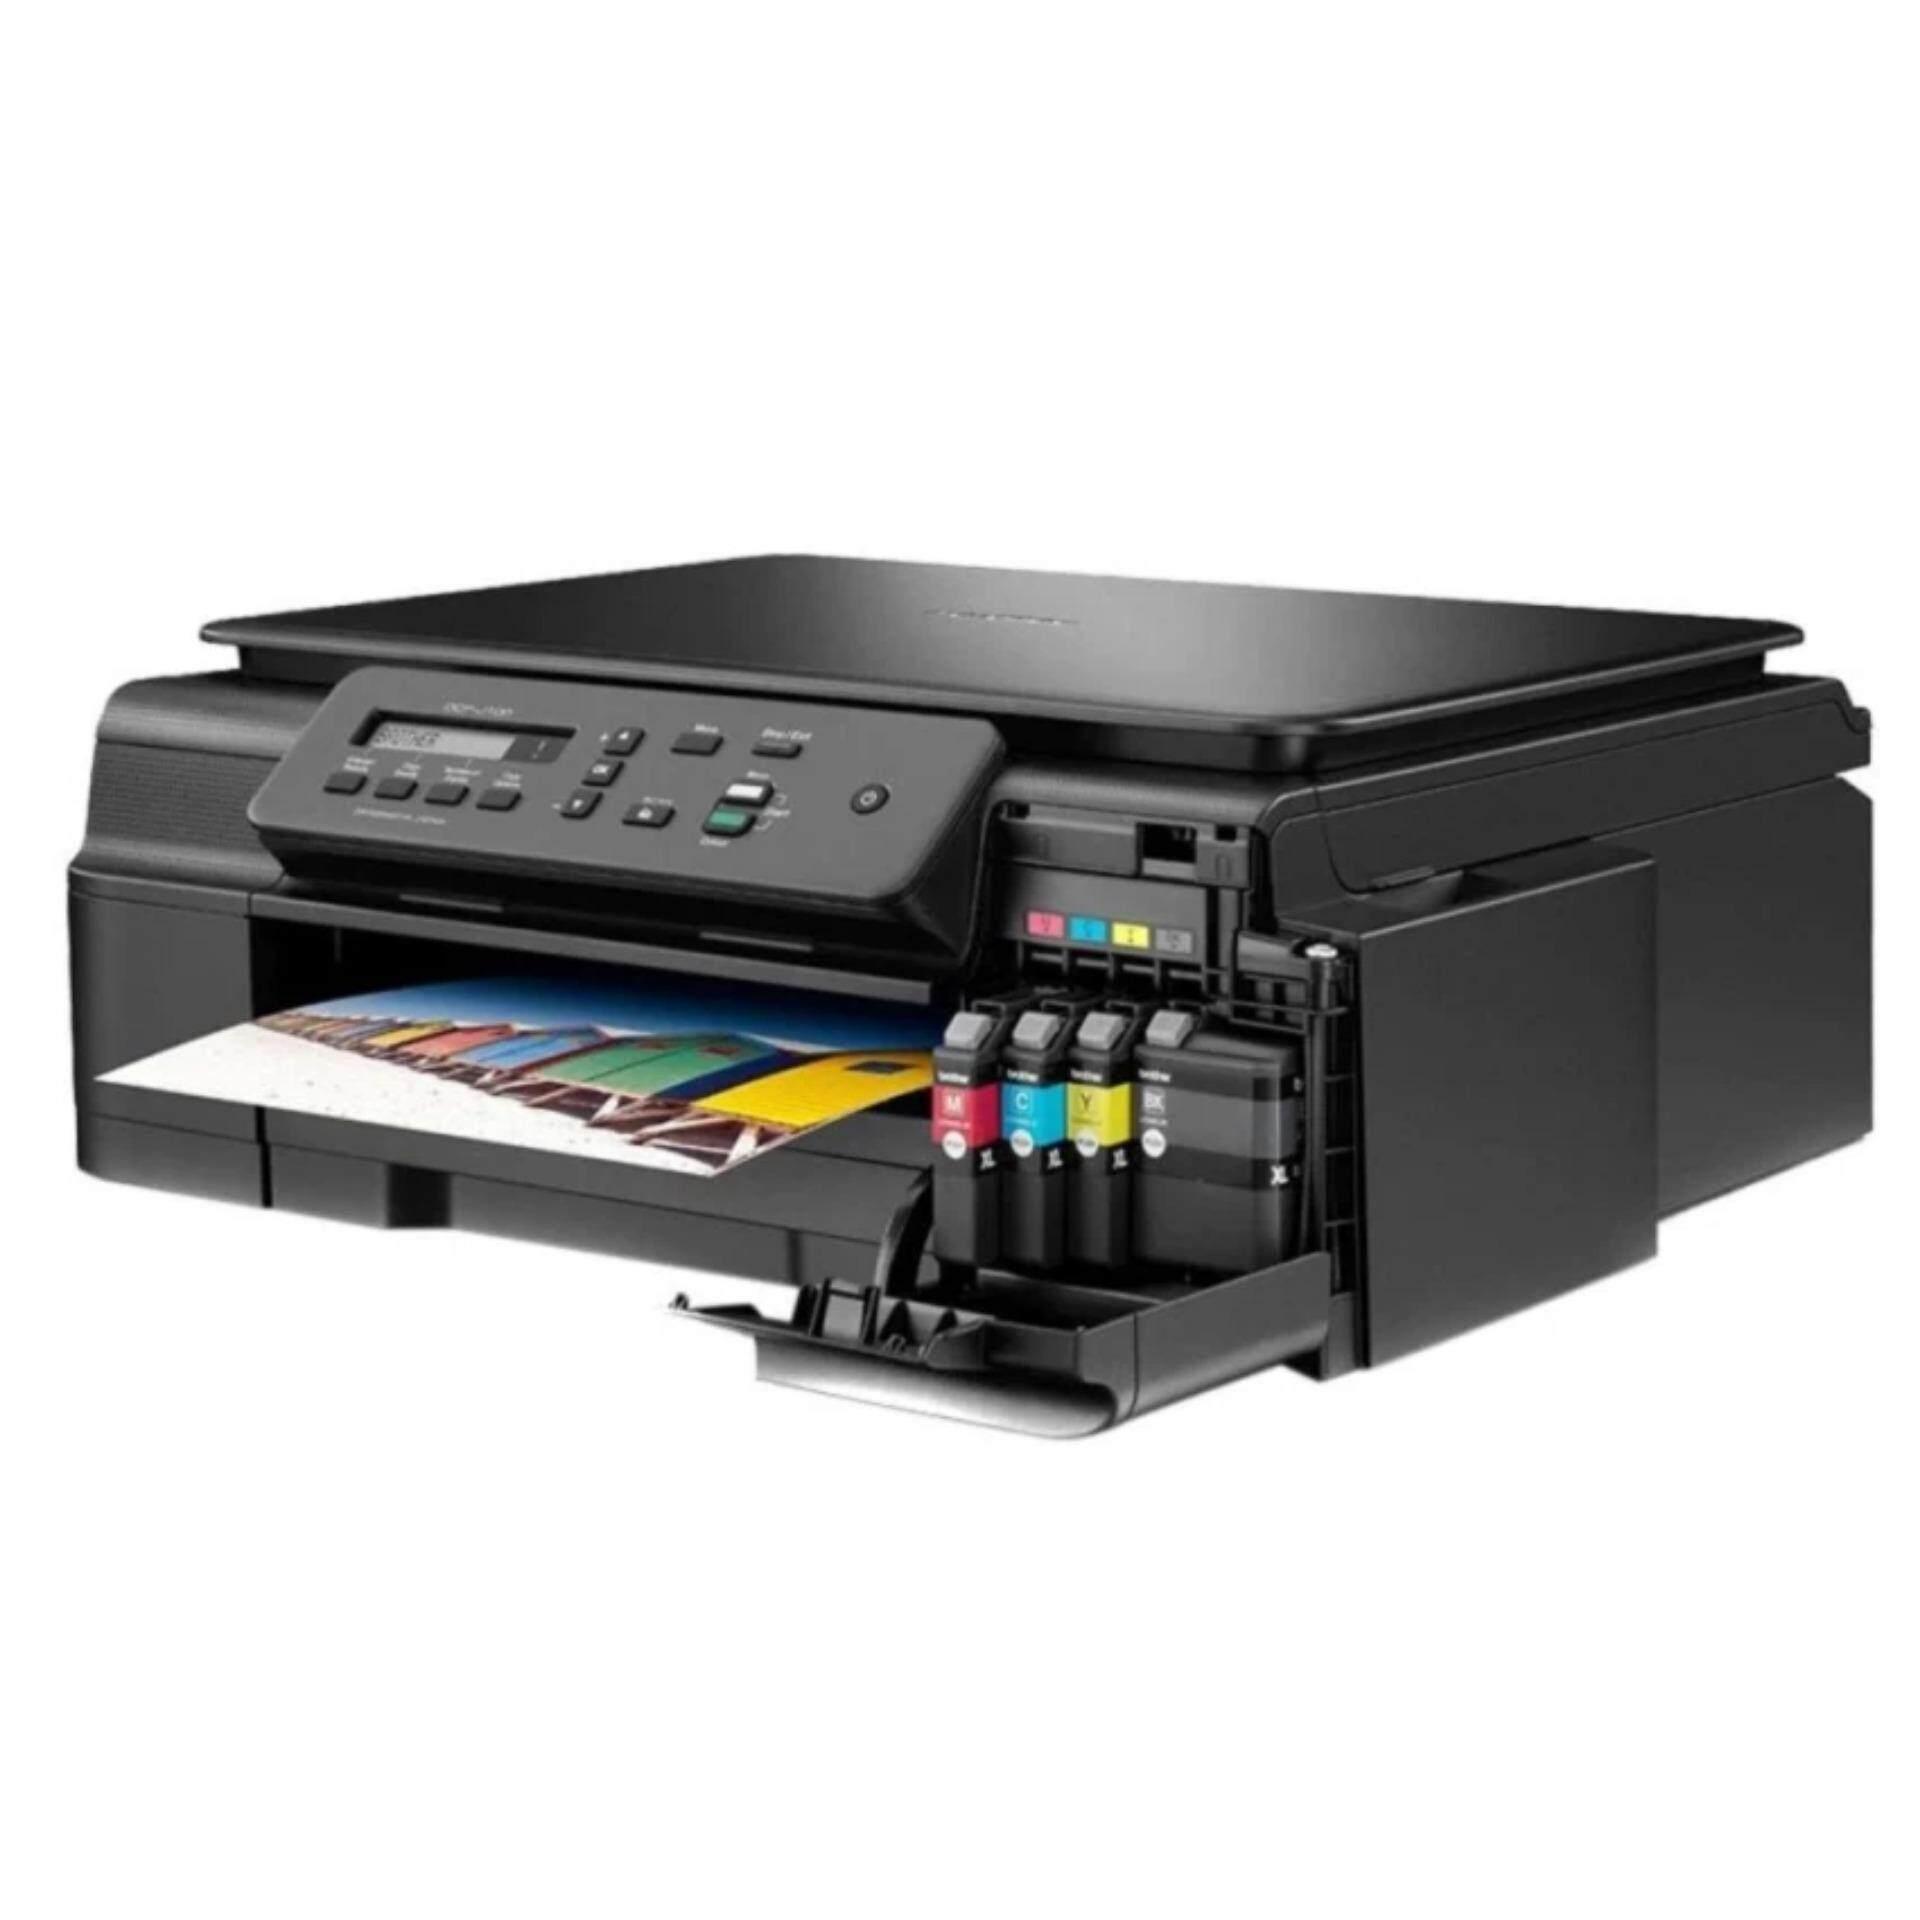 Brother DCP-J100 InkBenefit Printer (SCAN,COPY,PRINT)